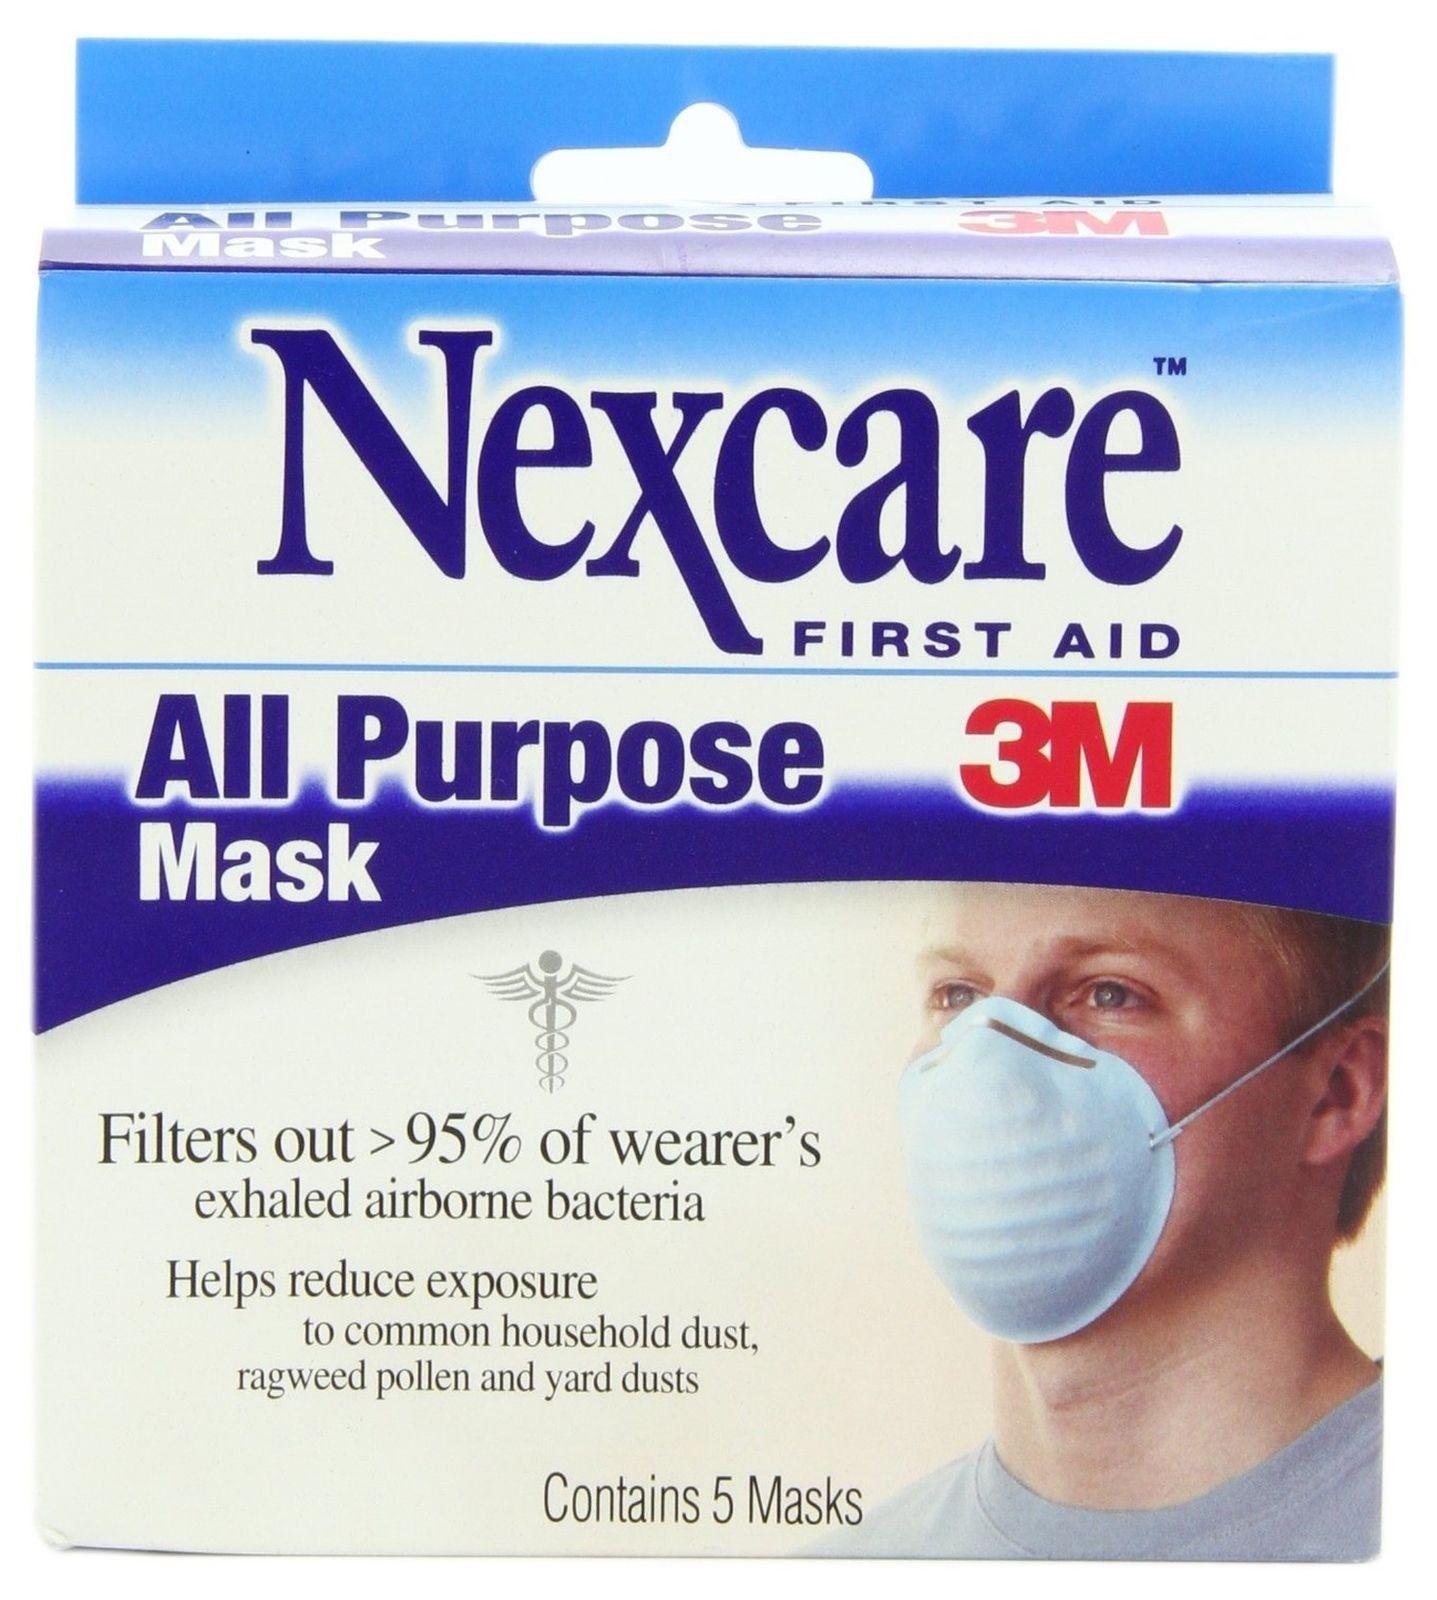 3m nexcare medical mask